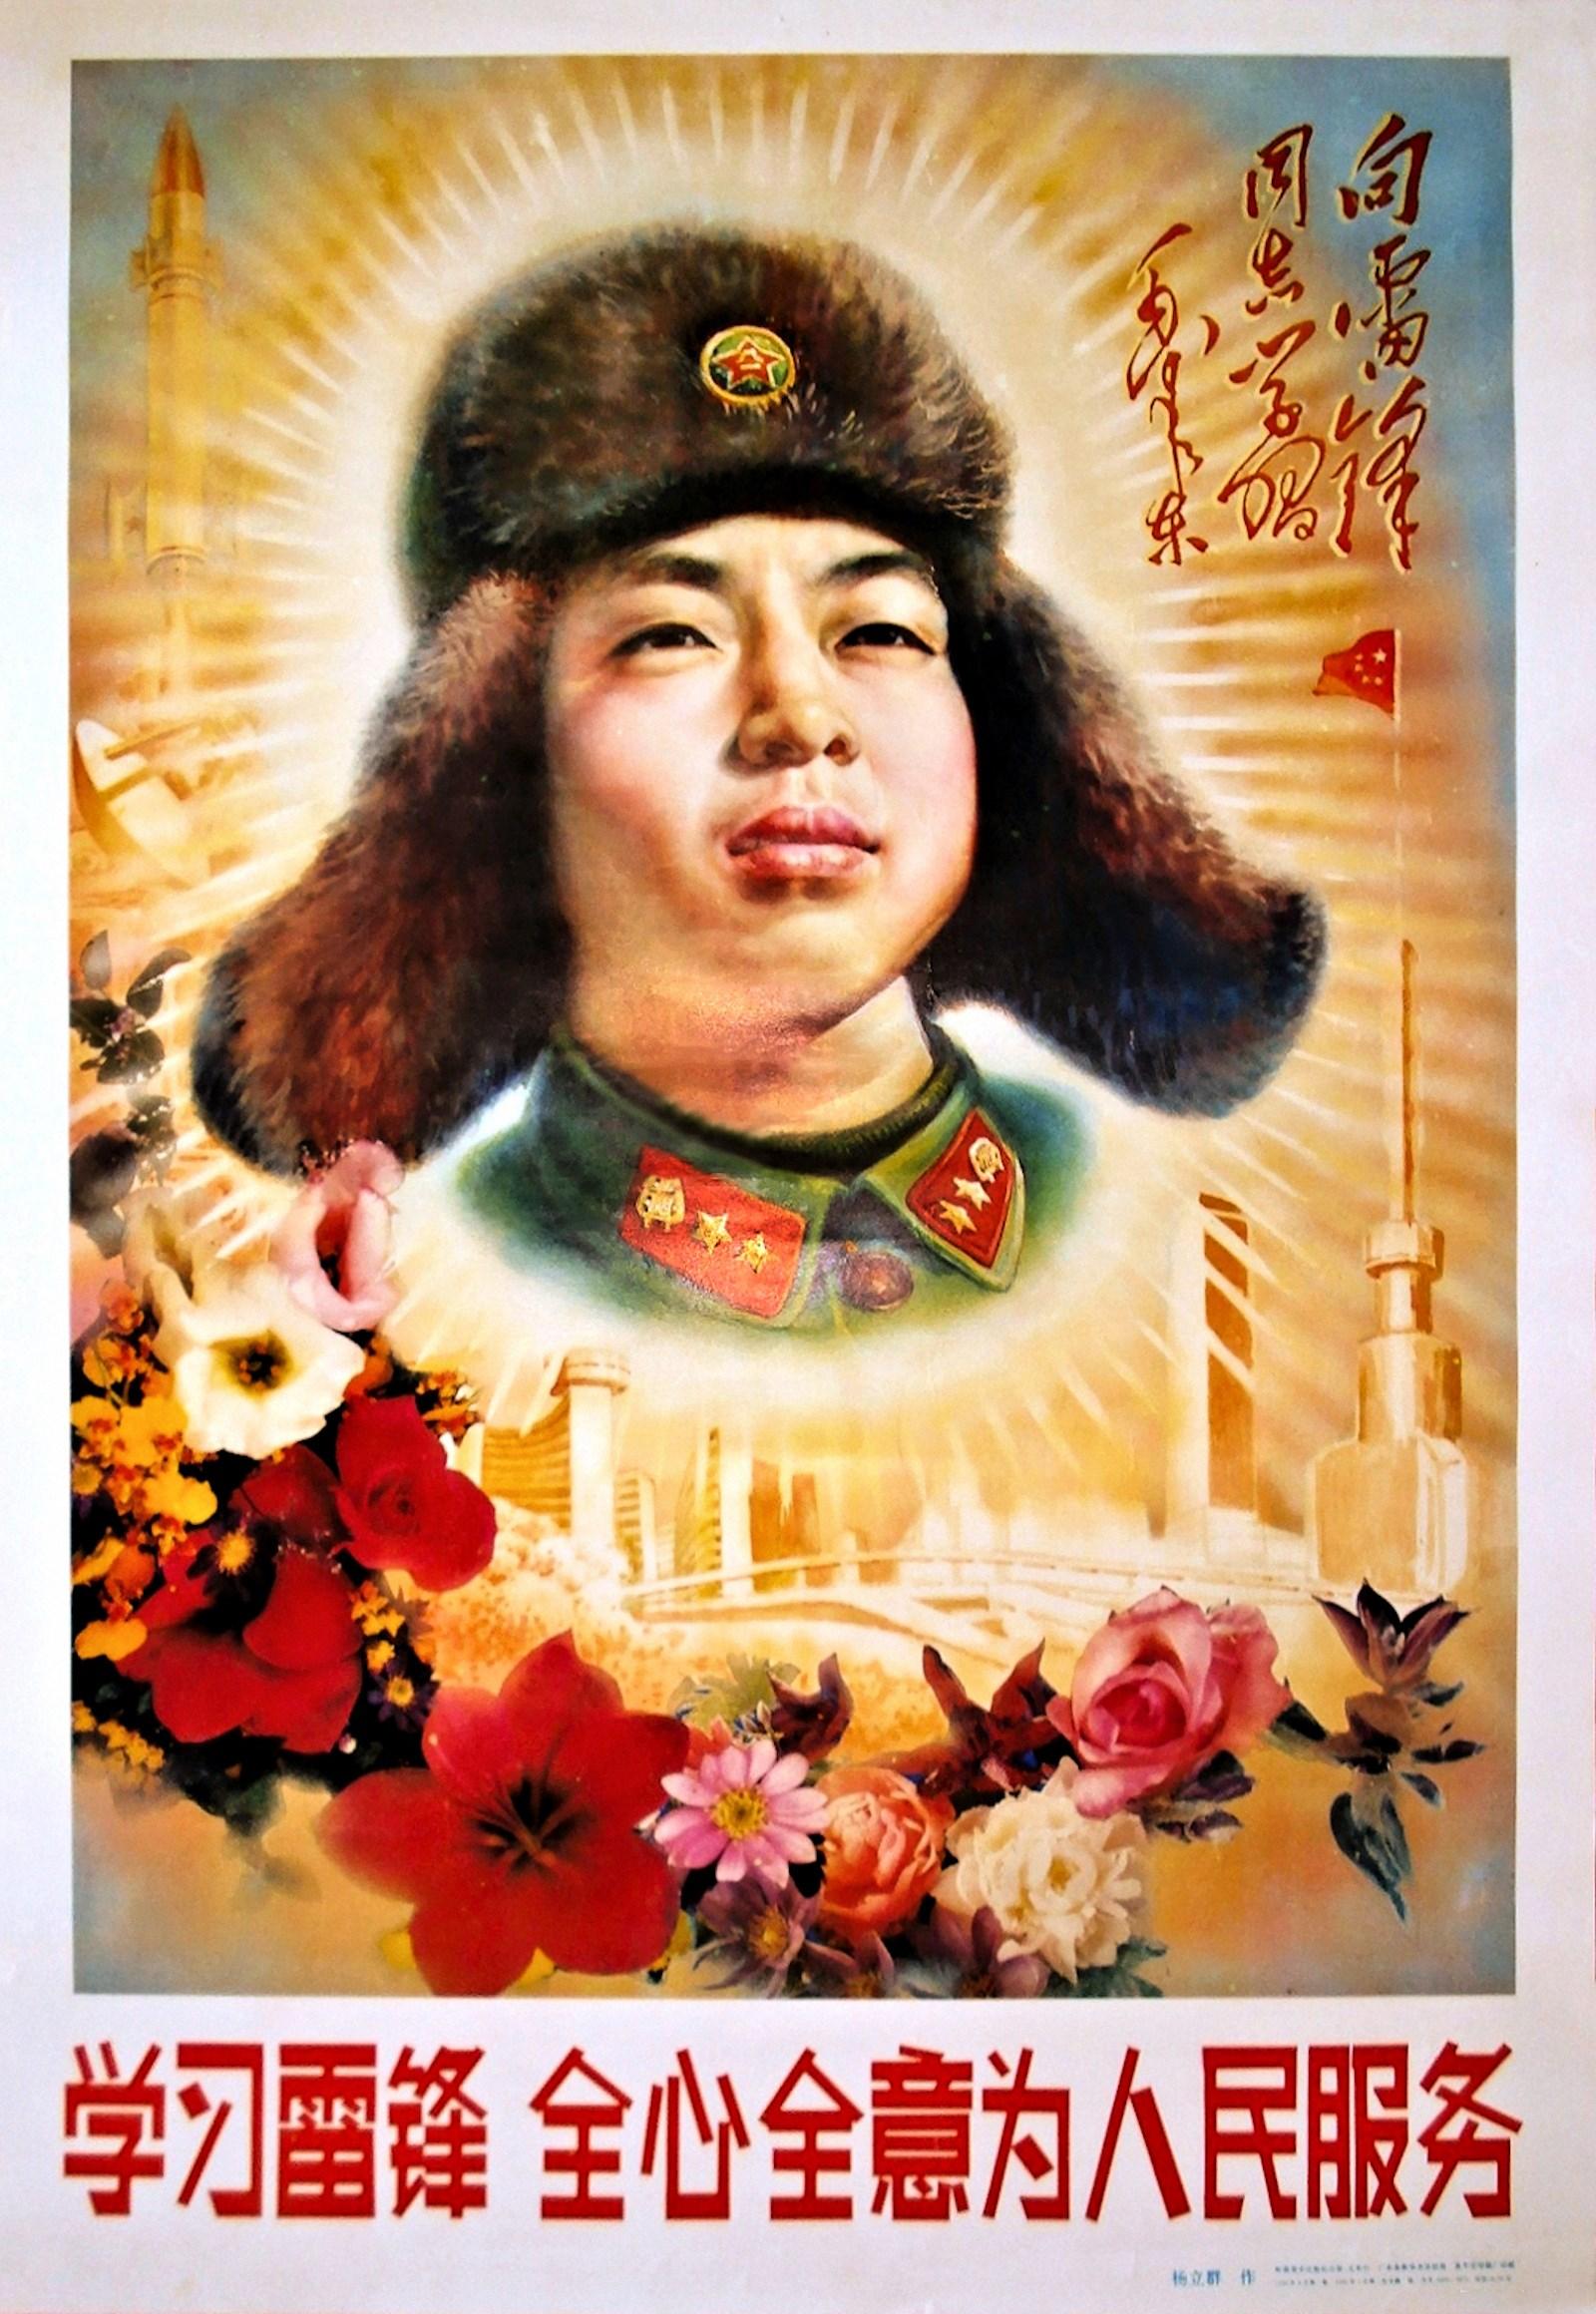 00 Lei Feng. China. 29.03.15